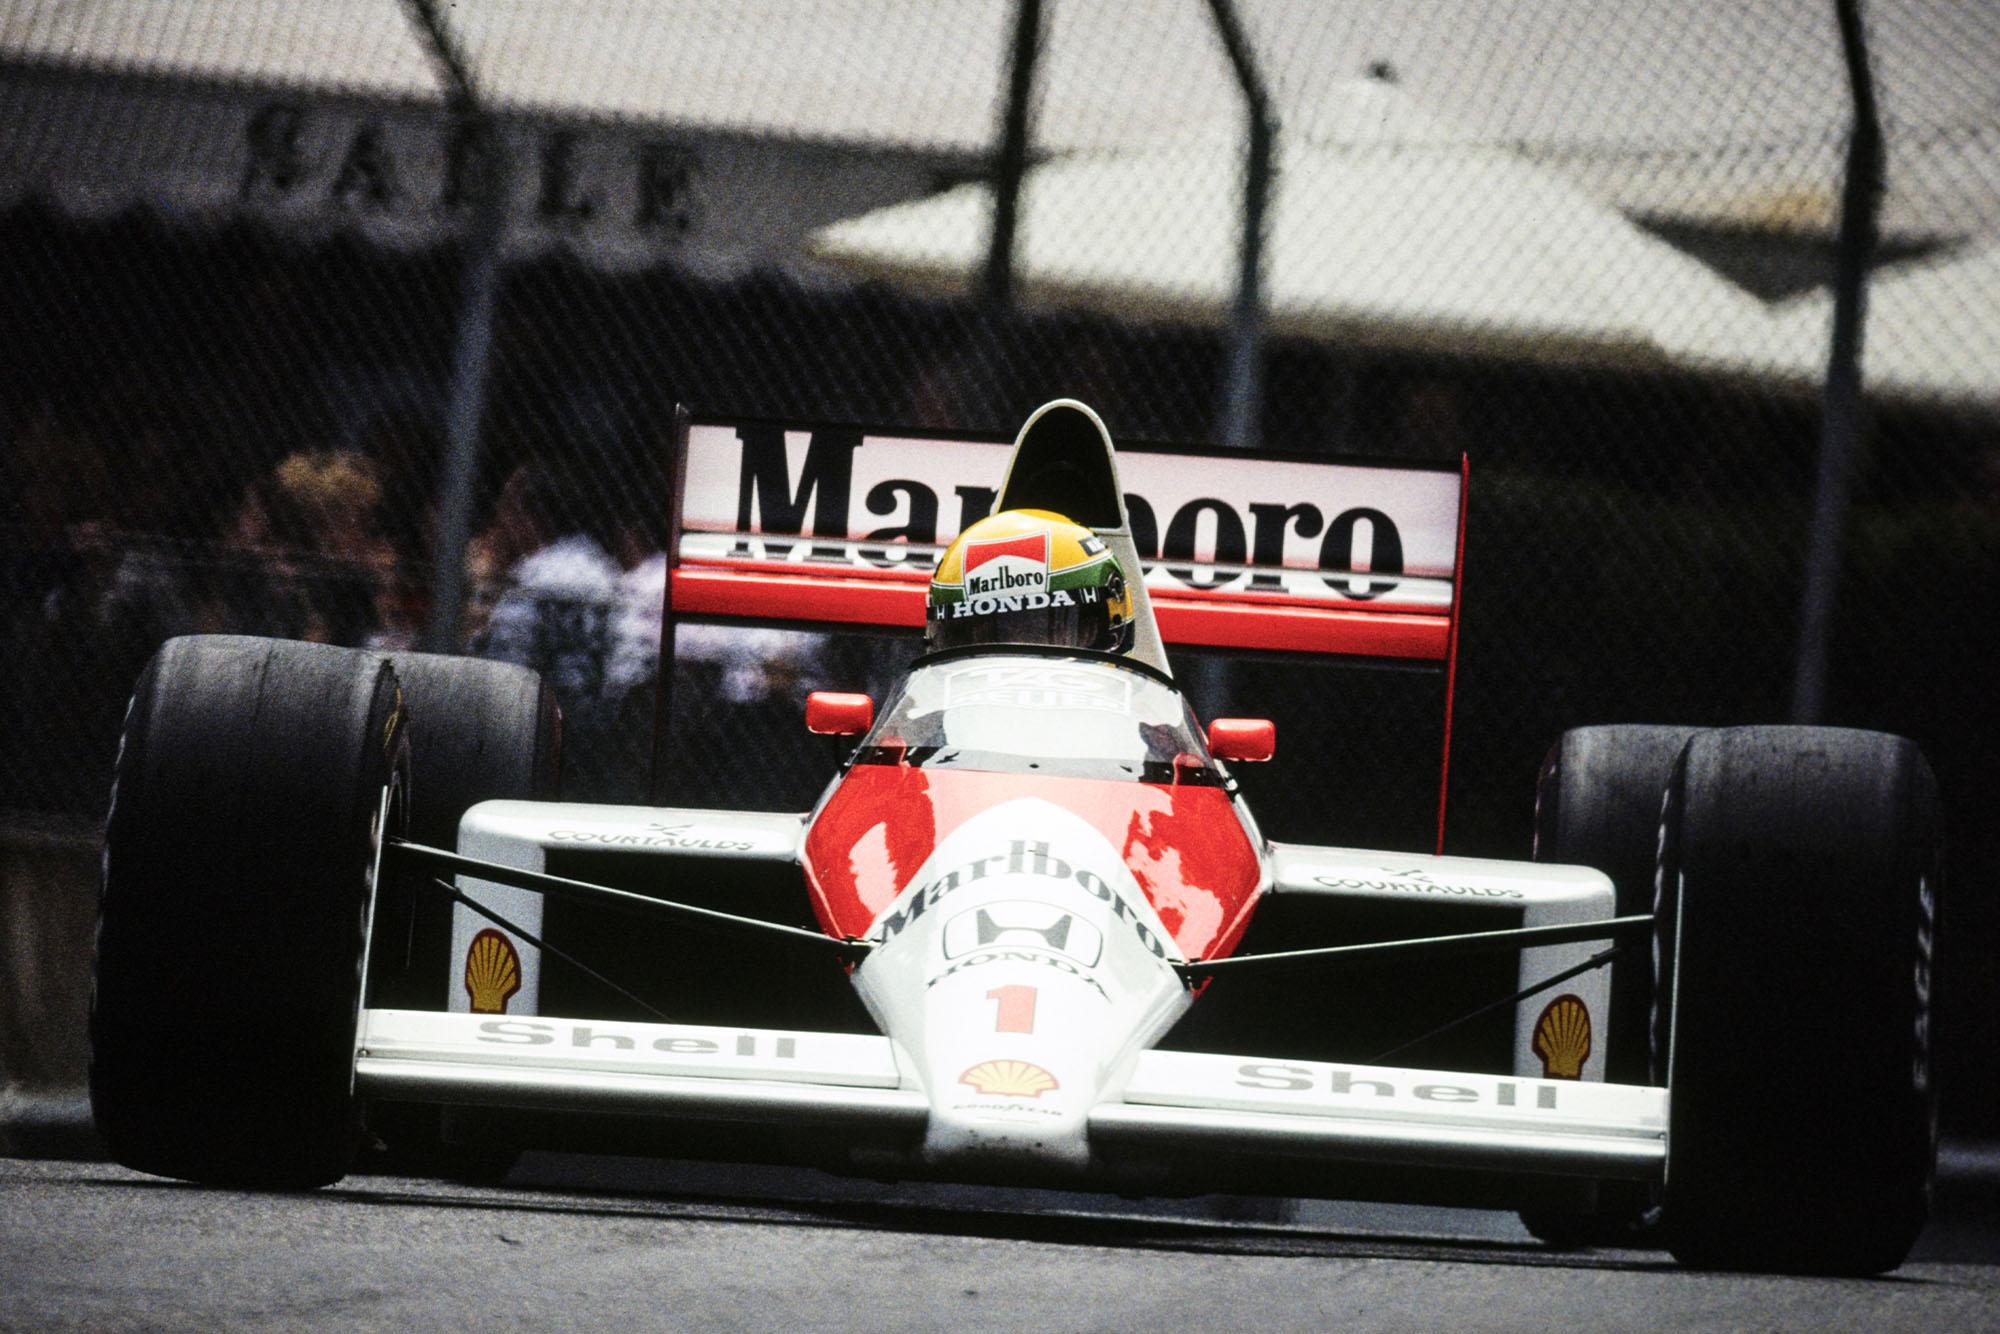 1989 Monaco GP feature